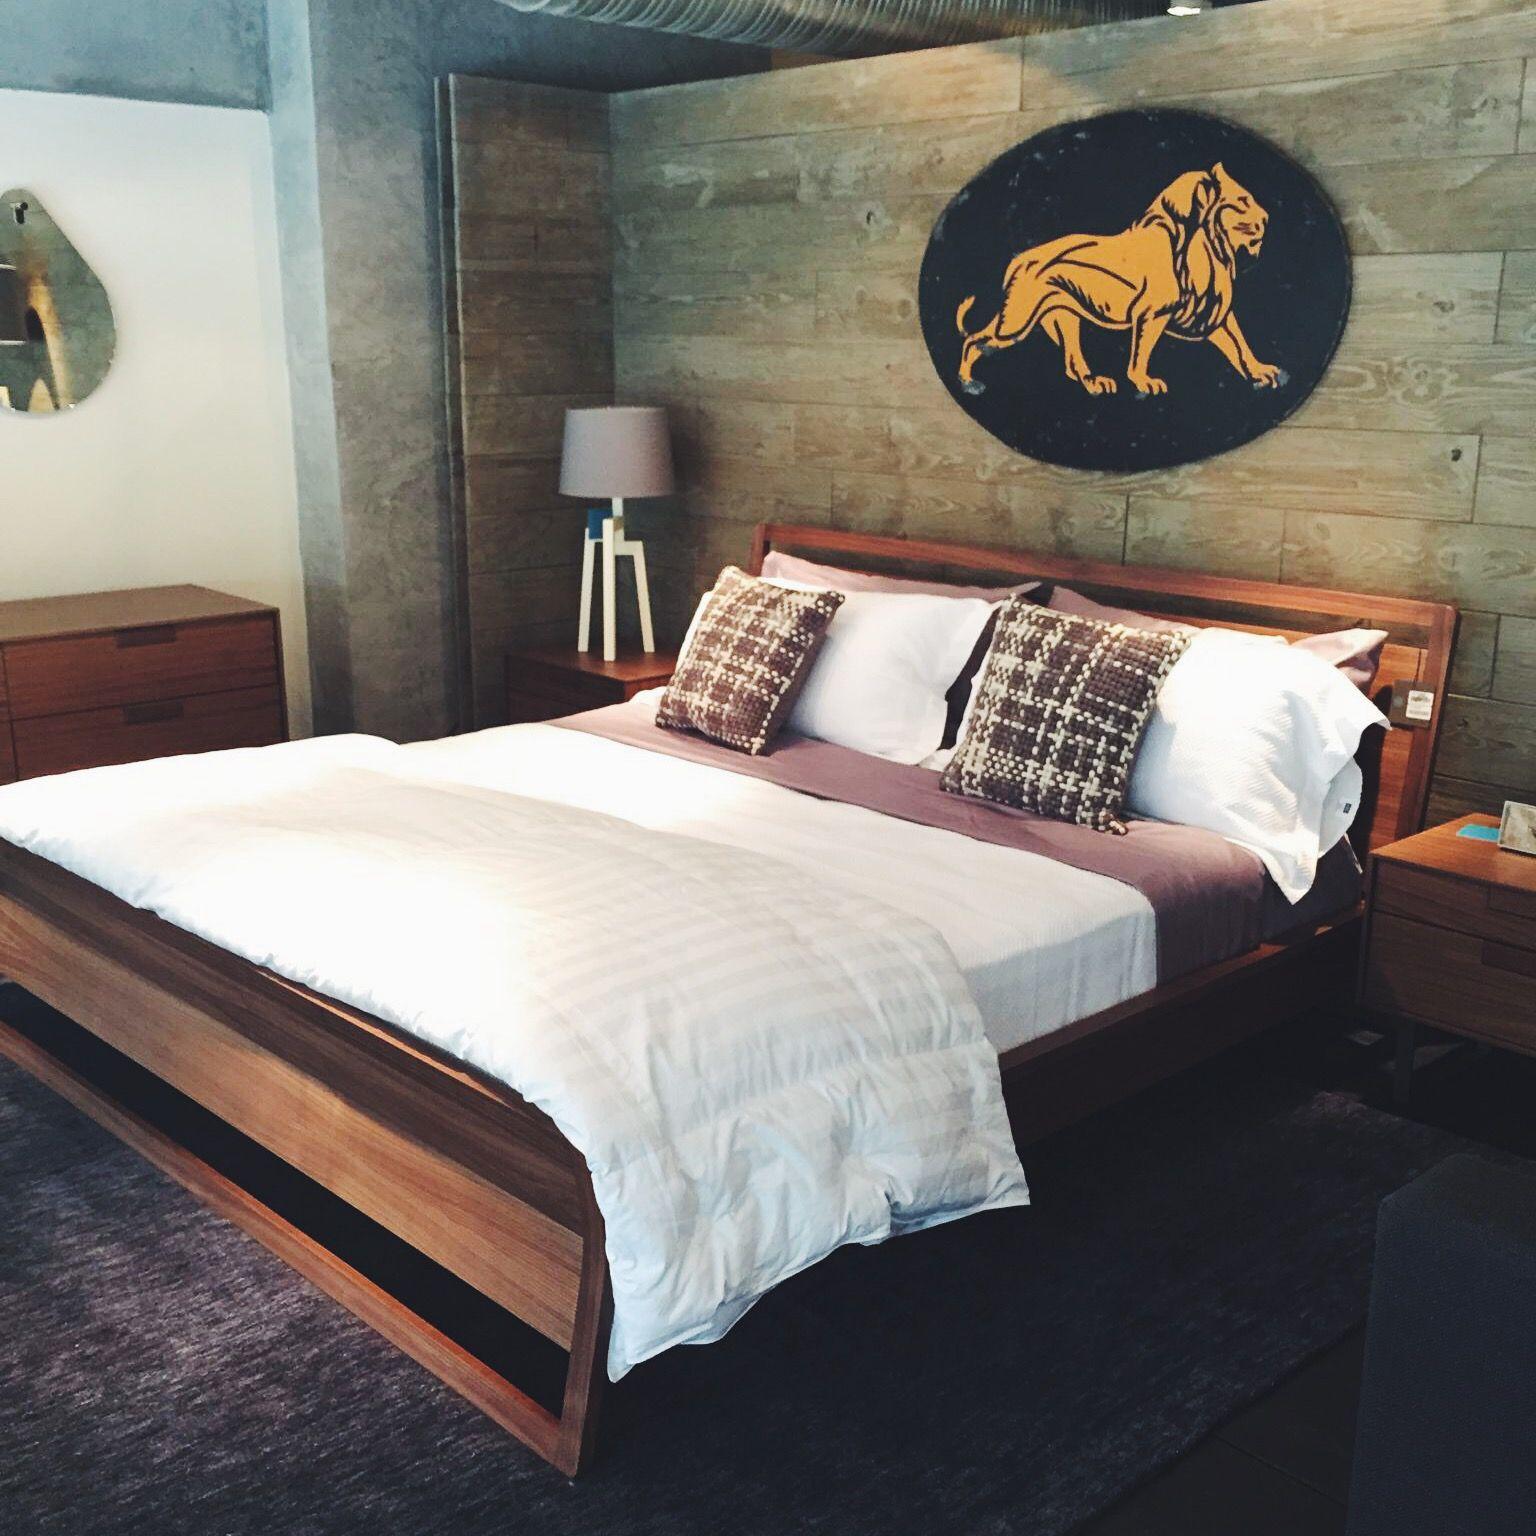 Morning wood blu dot woodrow bed bubbie pillow and stilt lamp modernbedroom modernfurniture modernbeds